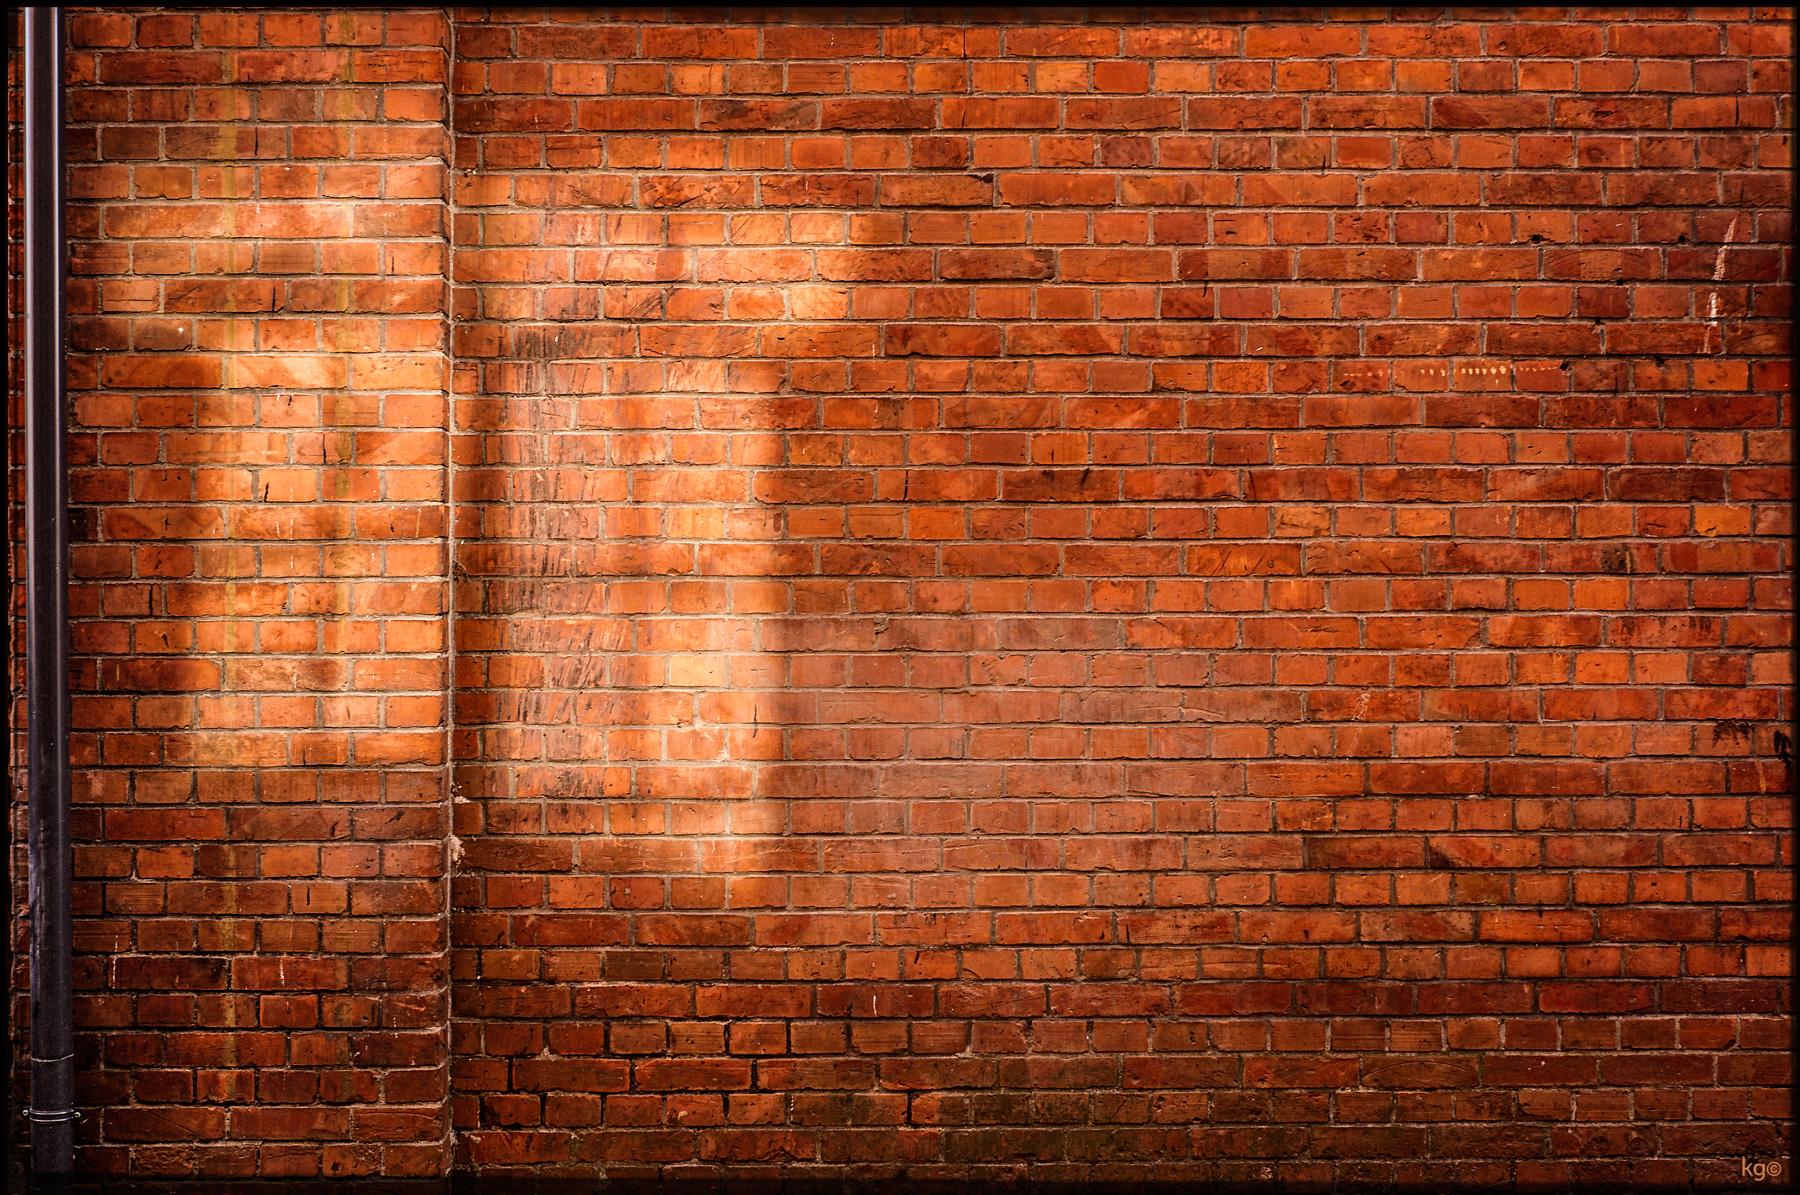 2015_09-Wall-with-windoe-reflection.jpg